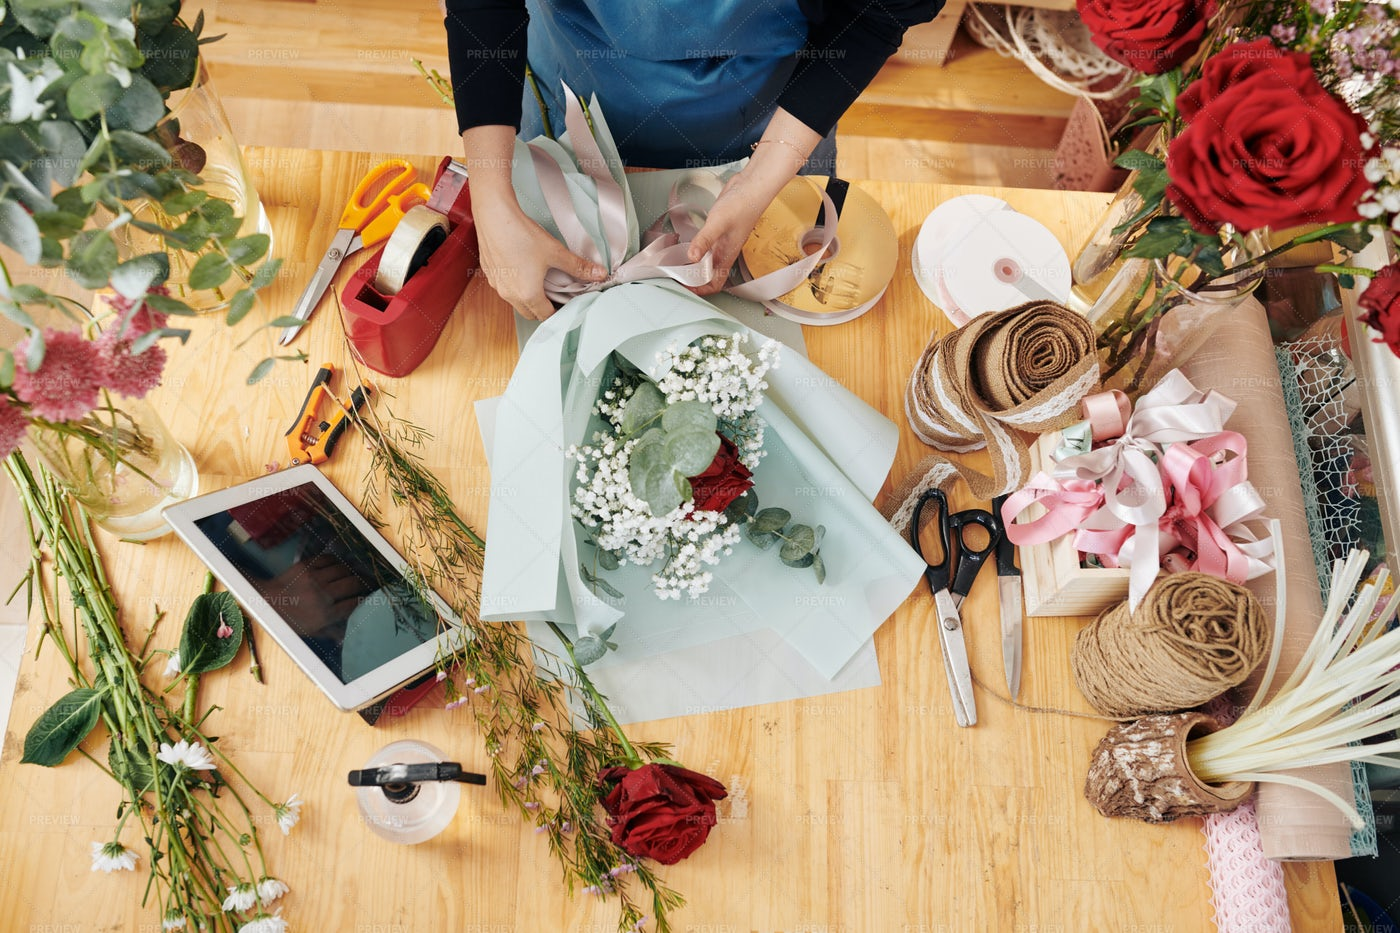 Florist Decorating Bouquet: Stock Photos